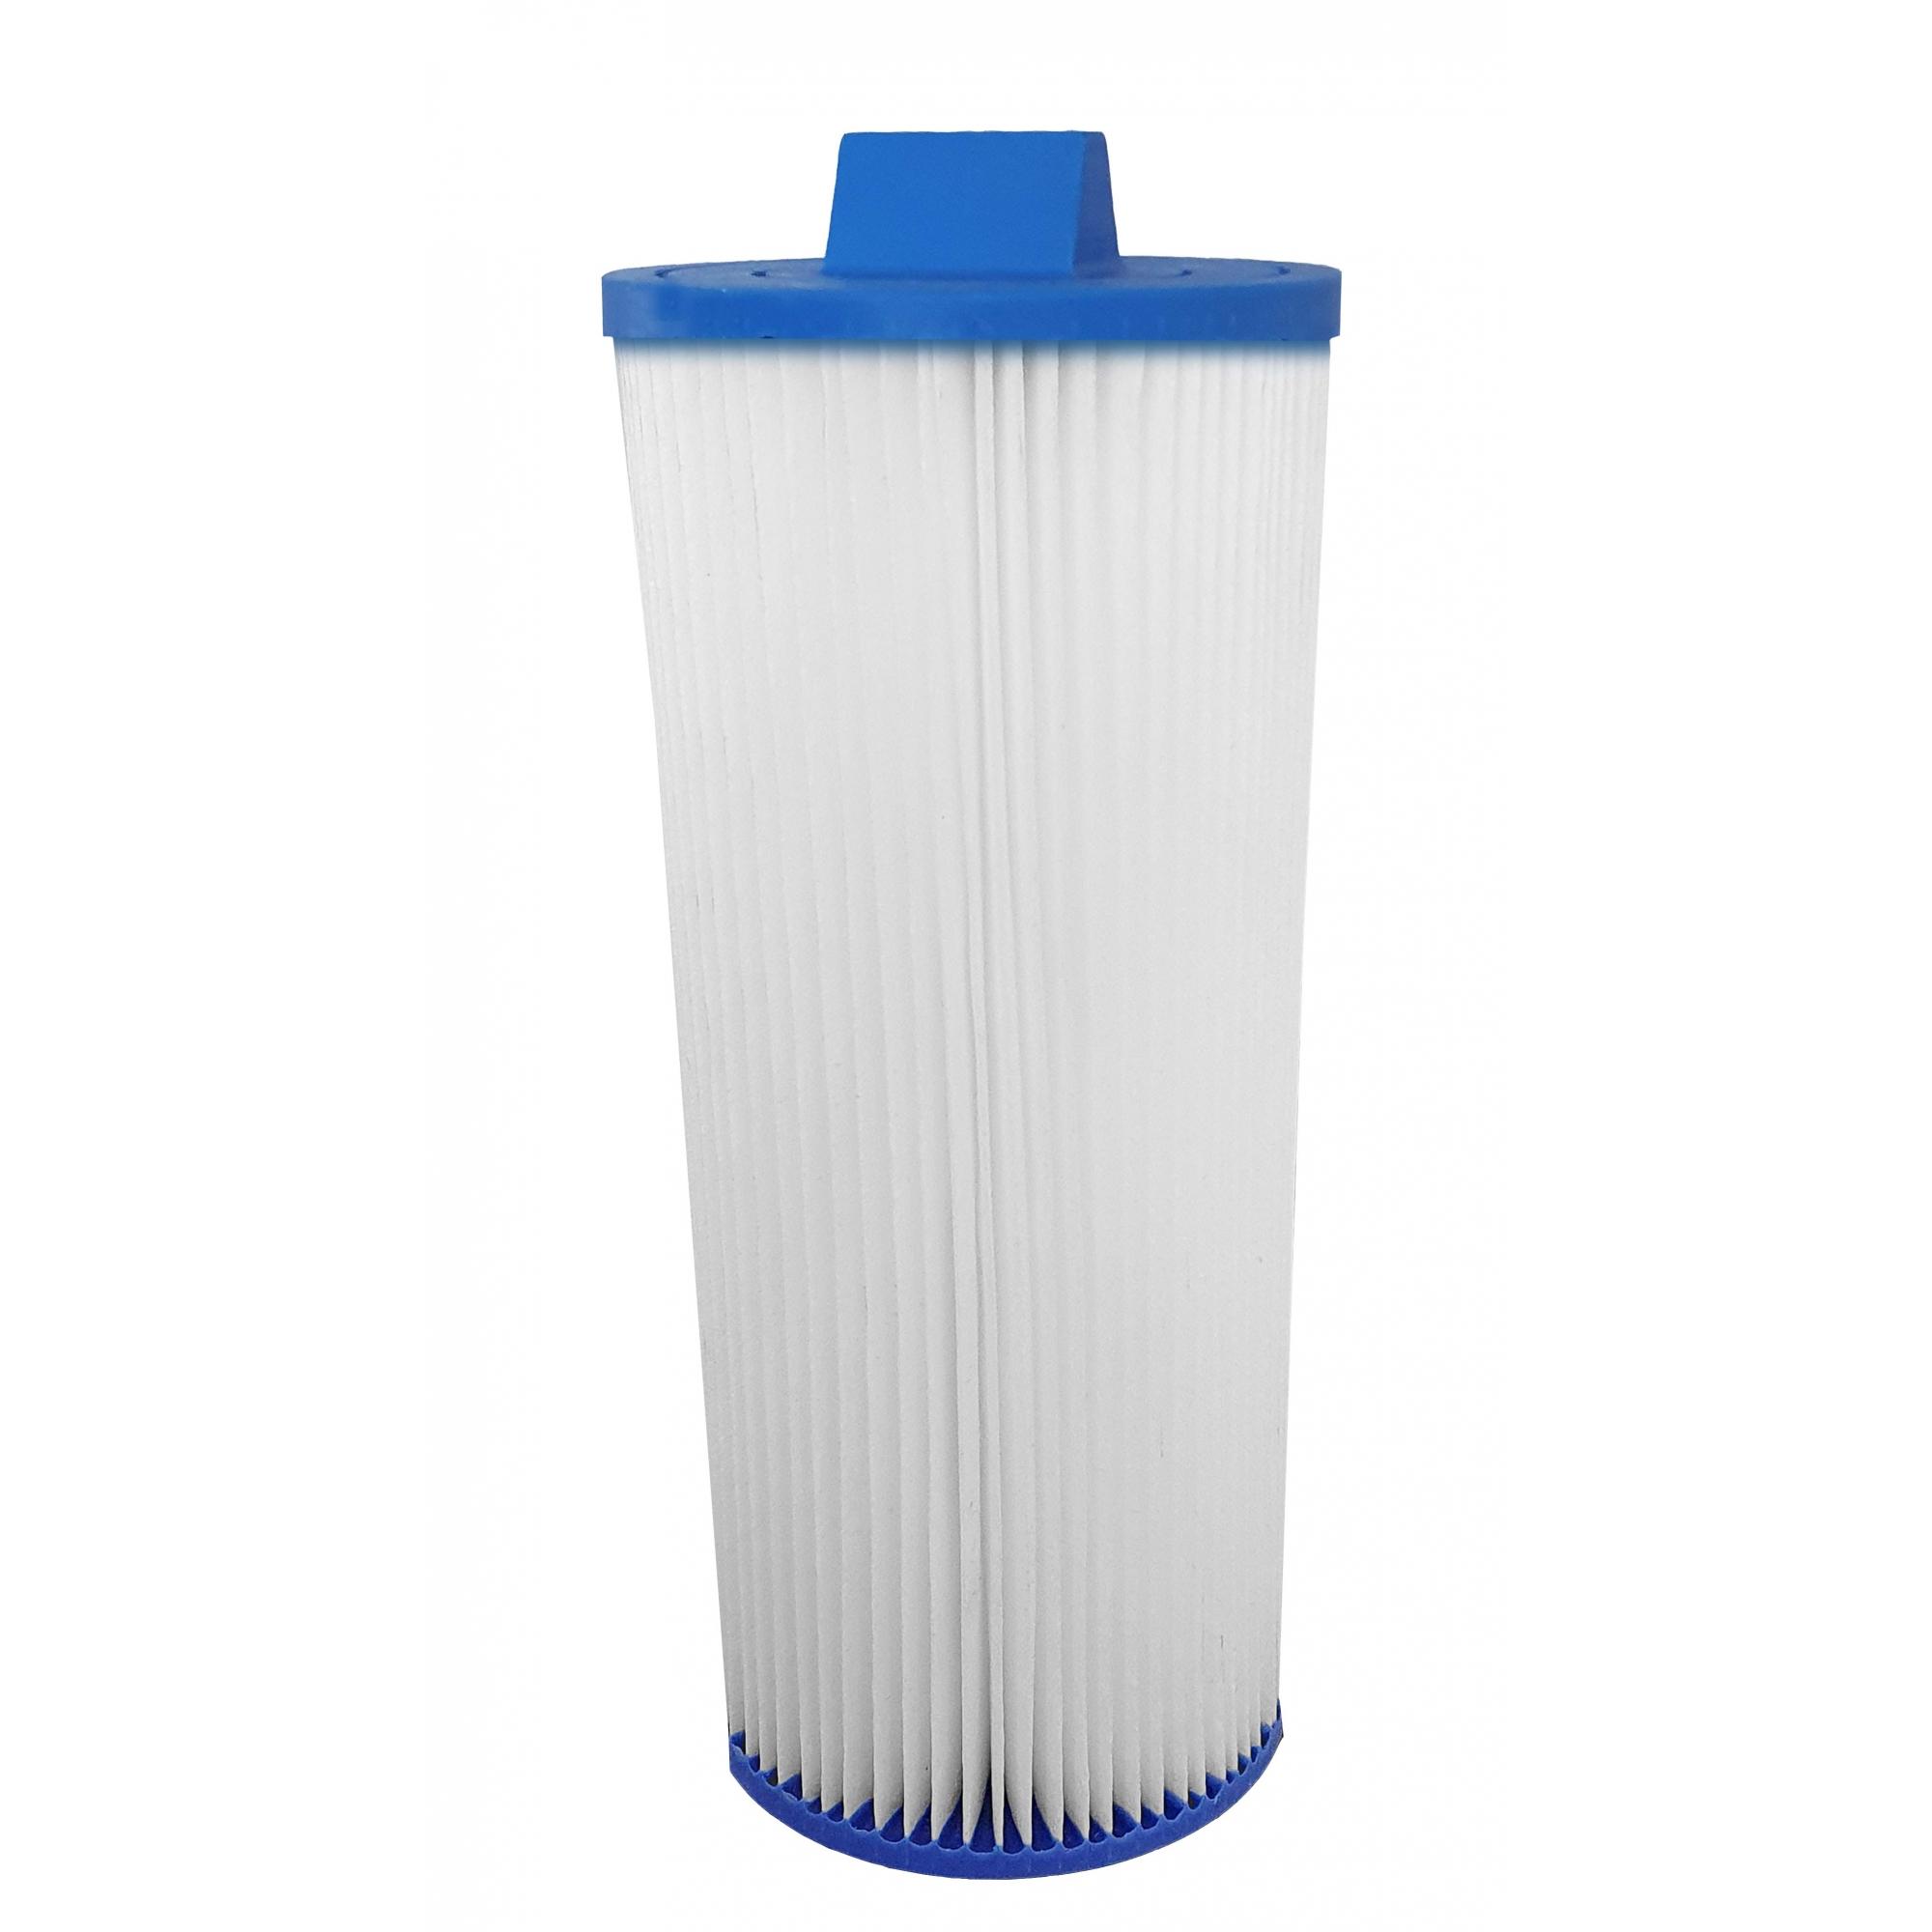 Filtro para SPA diâmetro de encaixe 40cm    códgo 106.0185